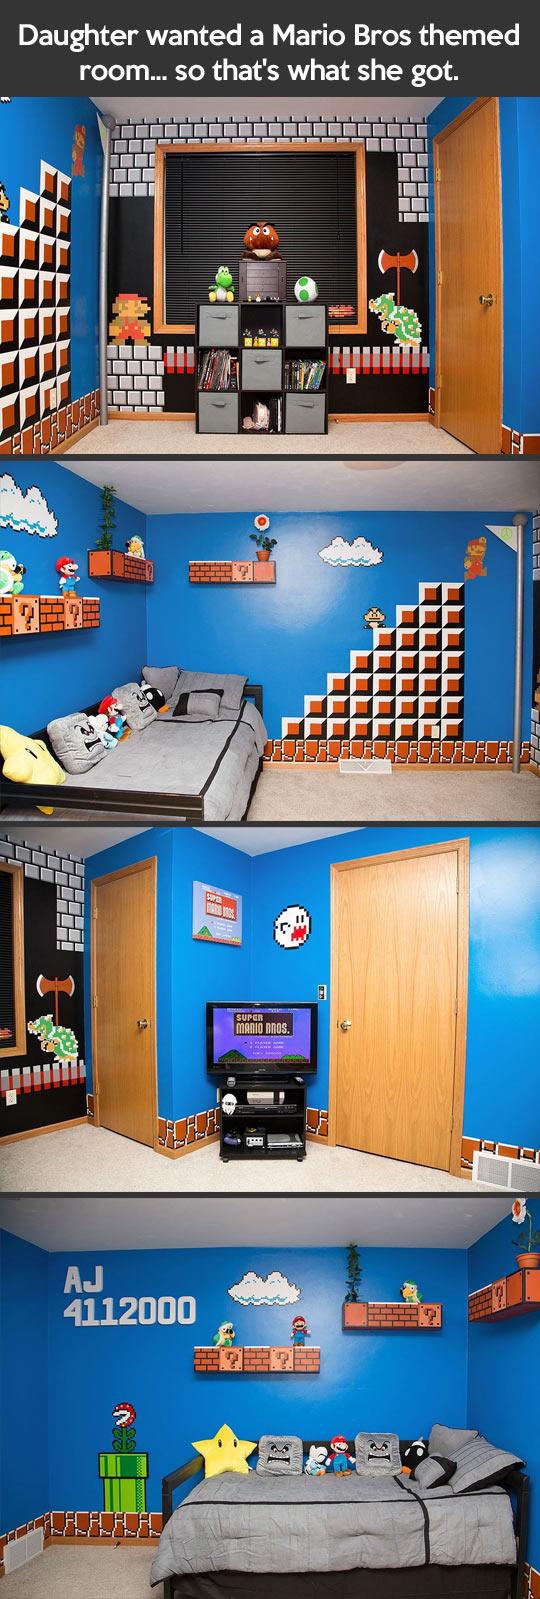 cool-Mario-Brothers-bedroom-deco